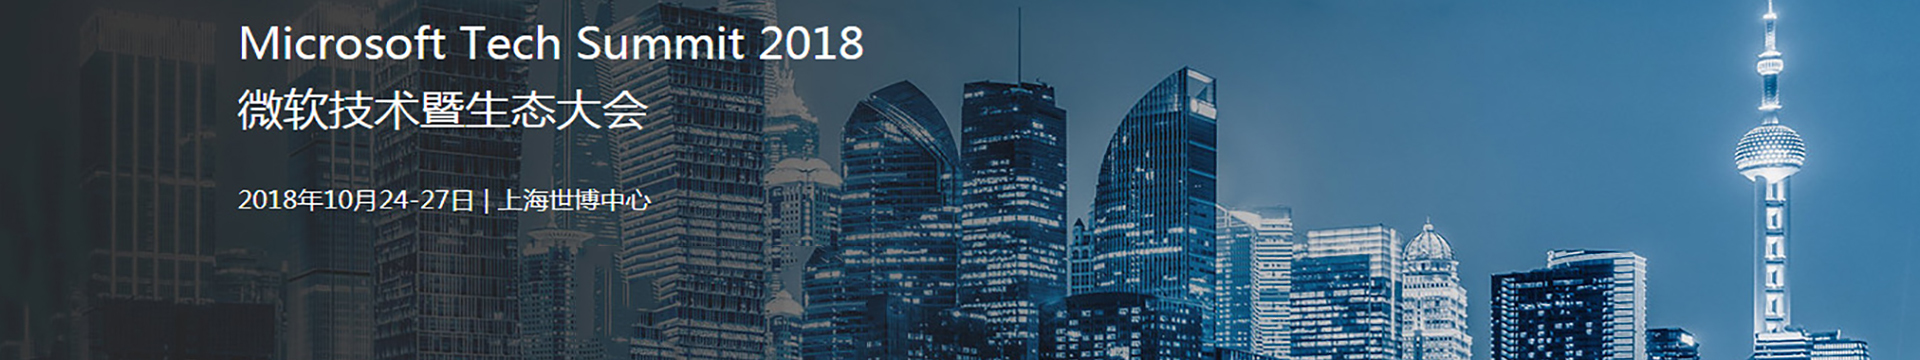 Microsoft Tech Summit 2018微软技术暨生态大会